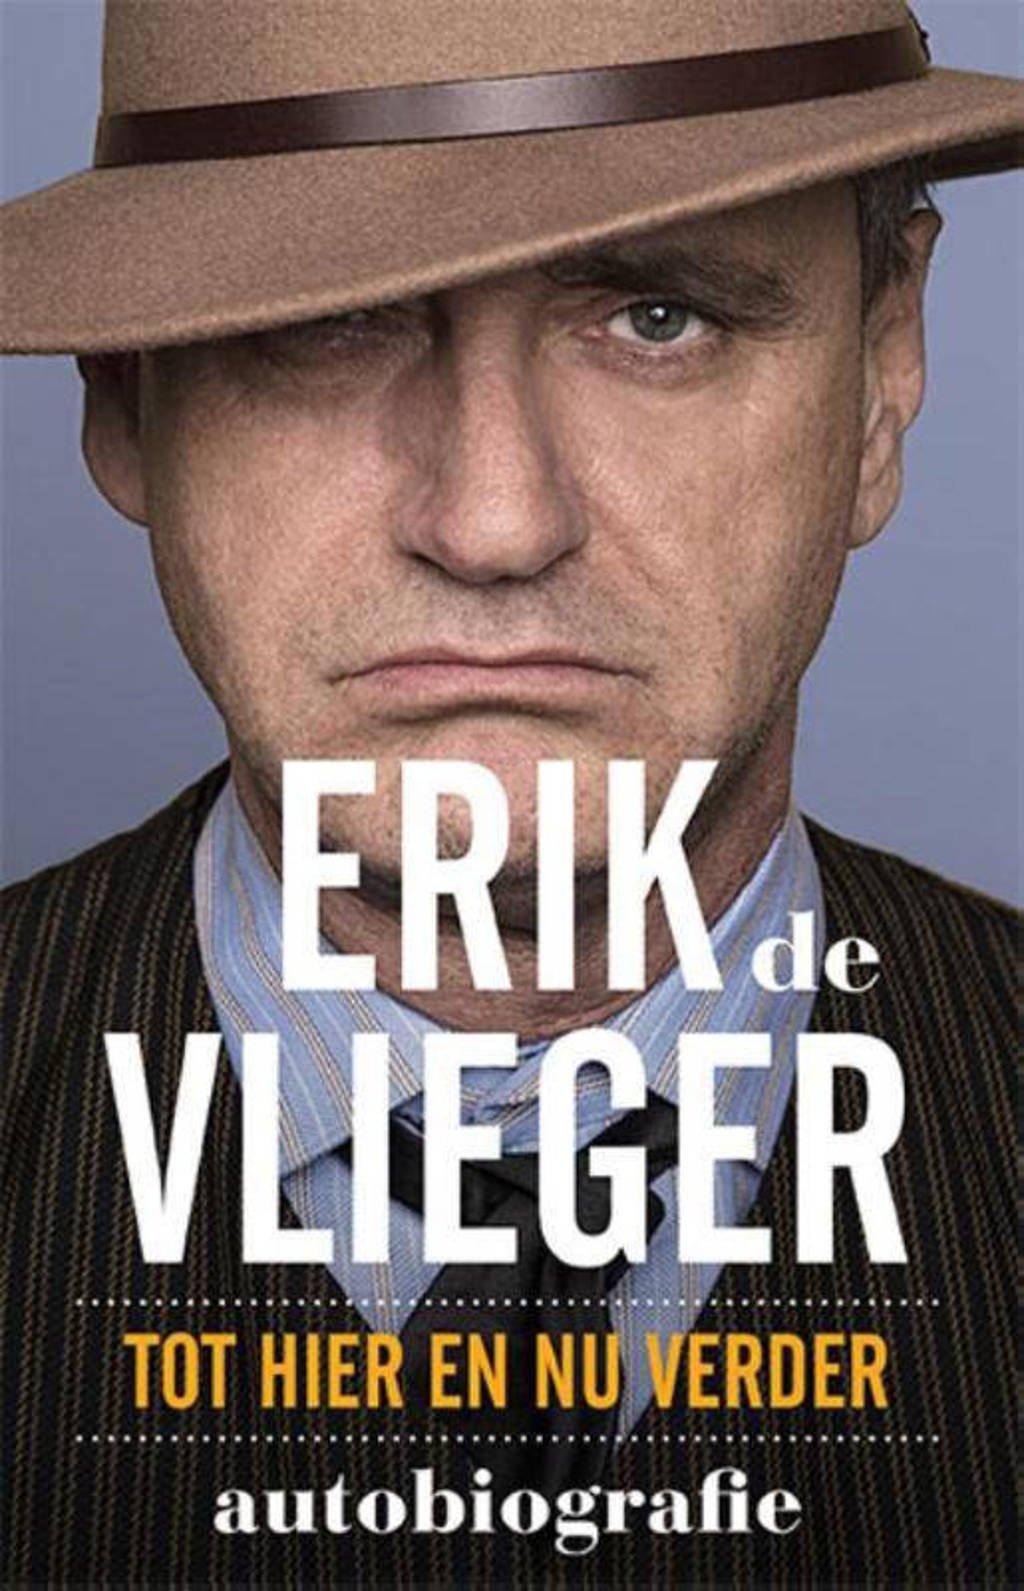 Erik de Vlieger Autobiografie - Erik de Vlieger